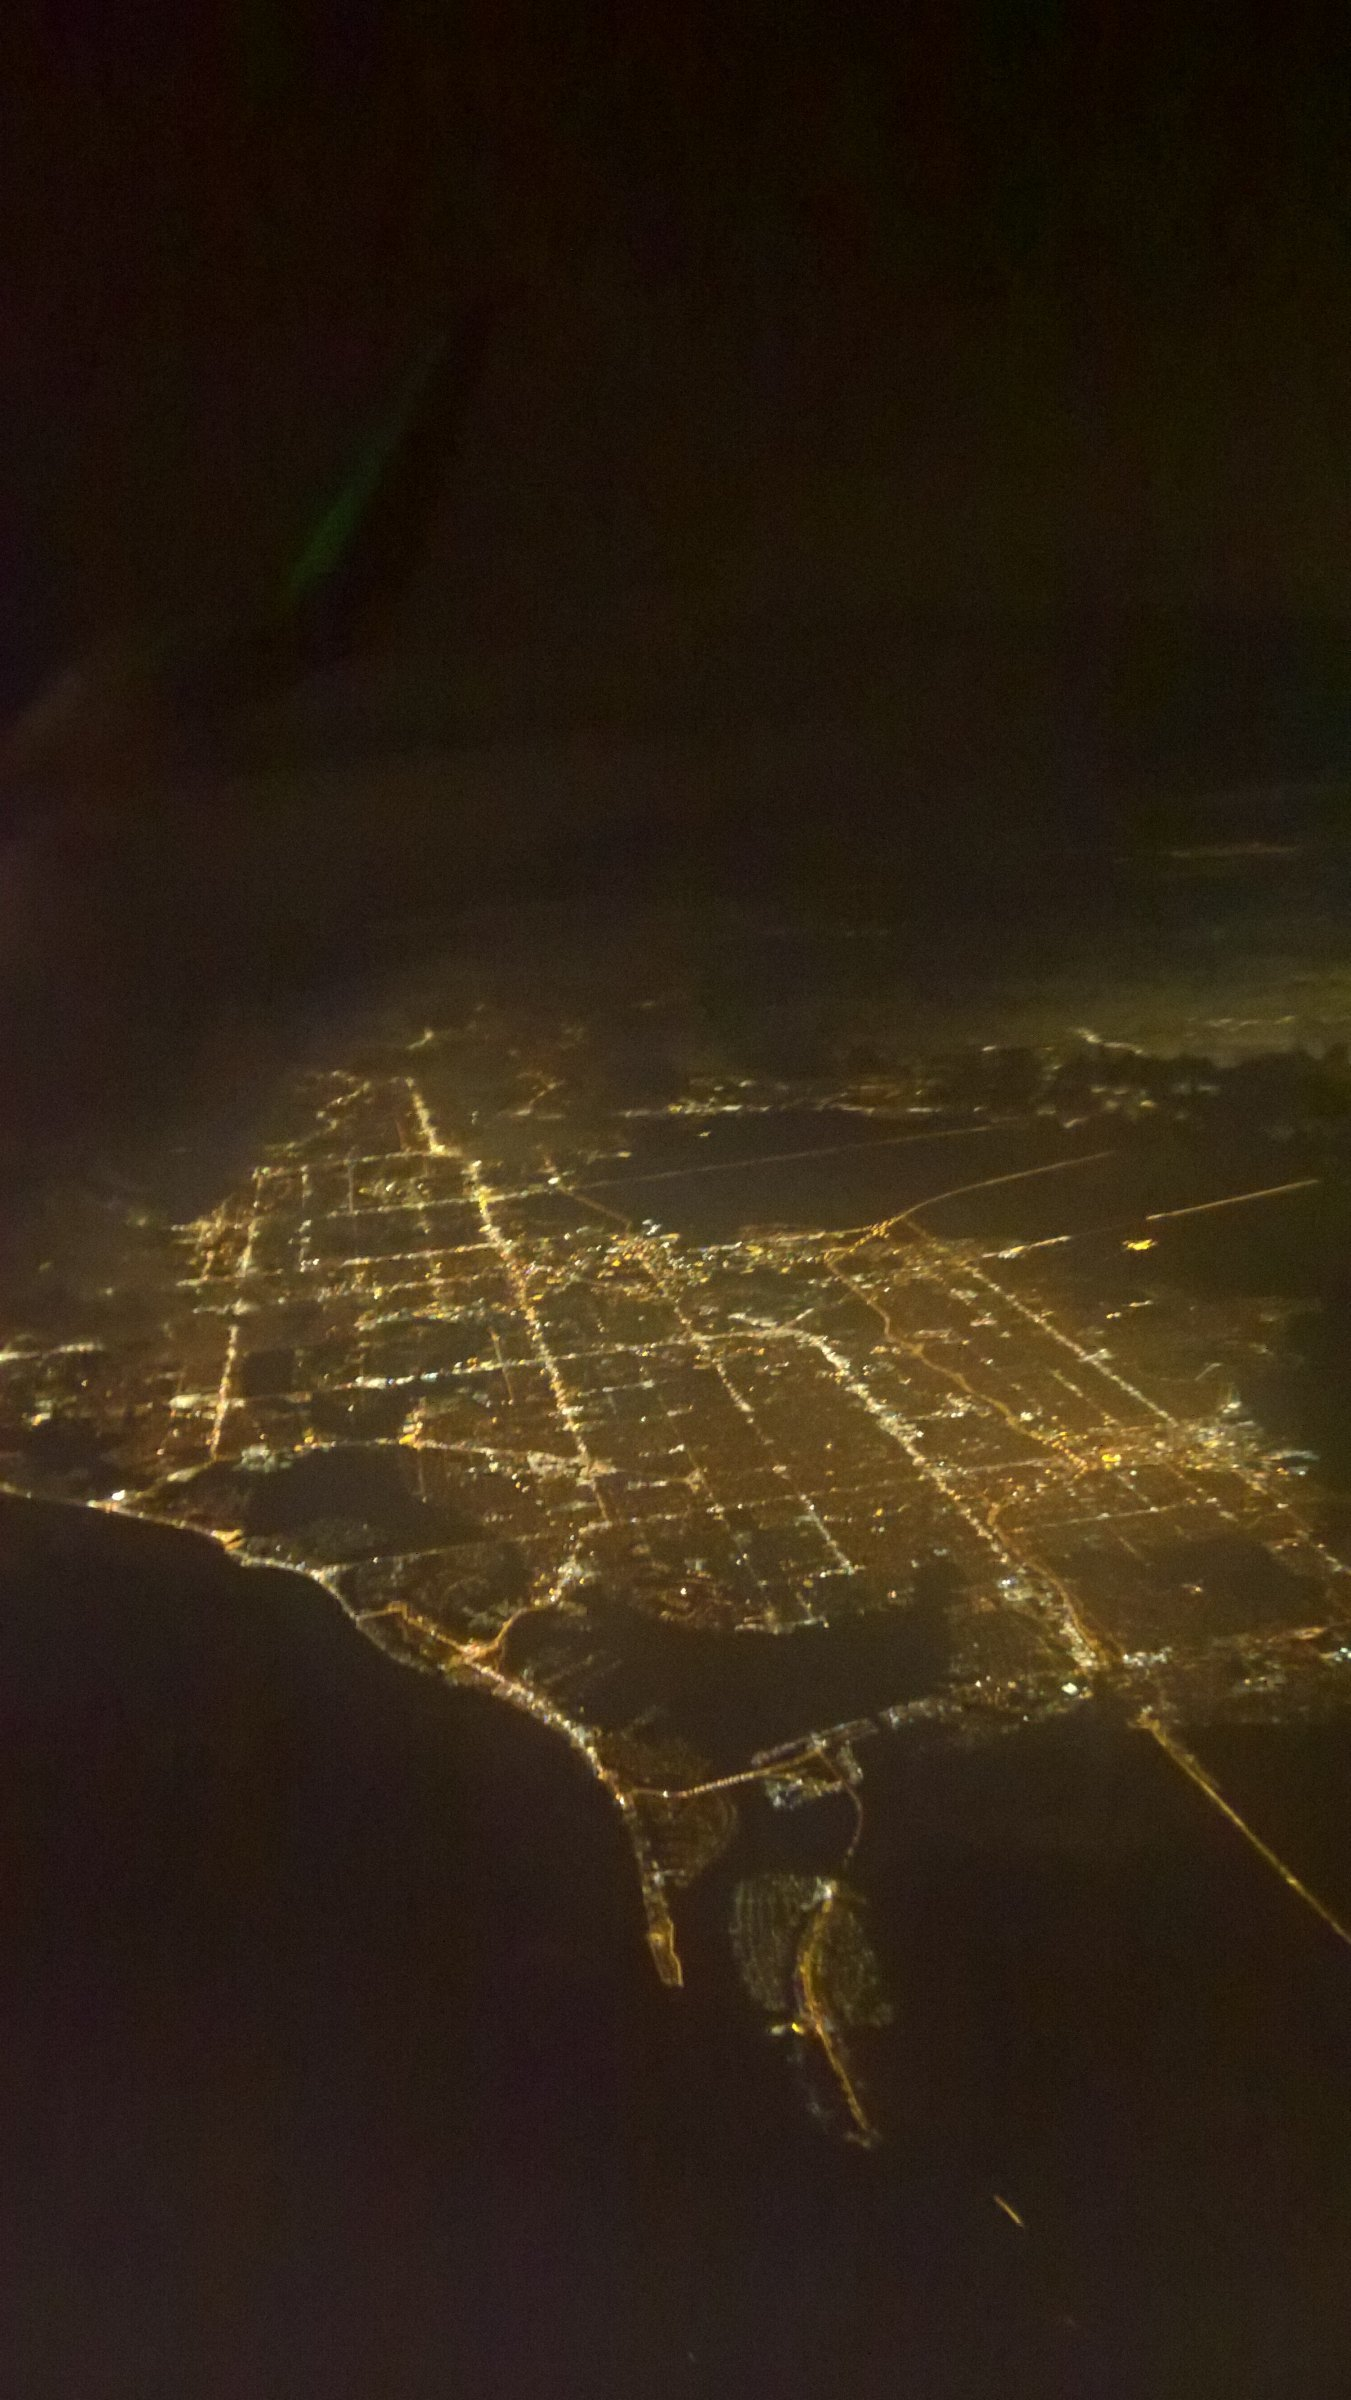 Flug DГјsseldorf Las Vegas